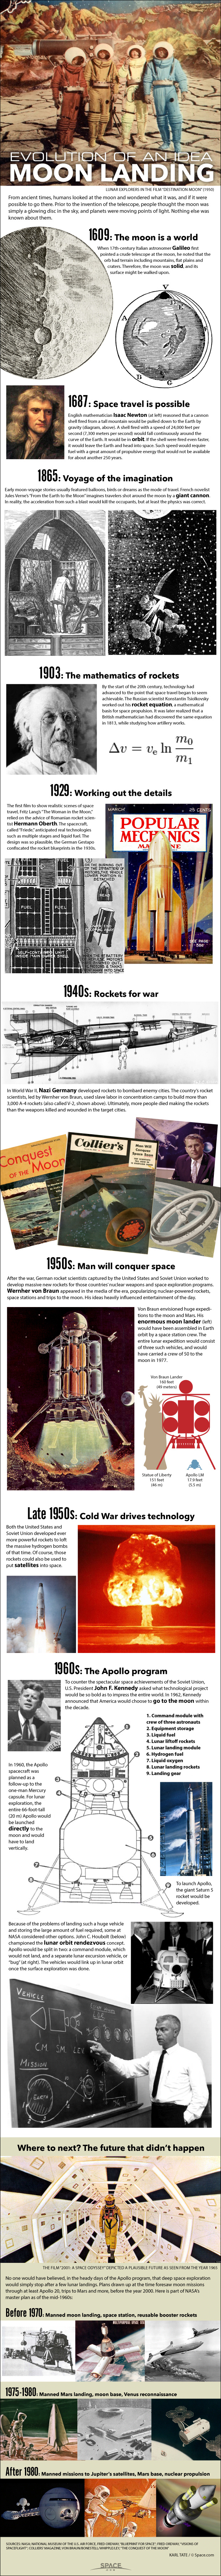 the first moon landing essay